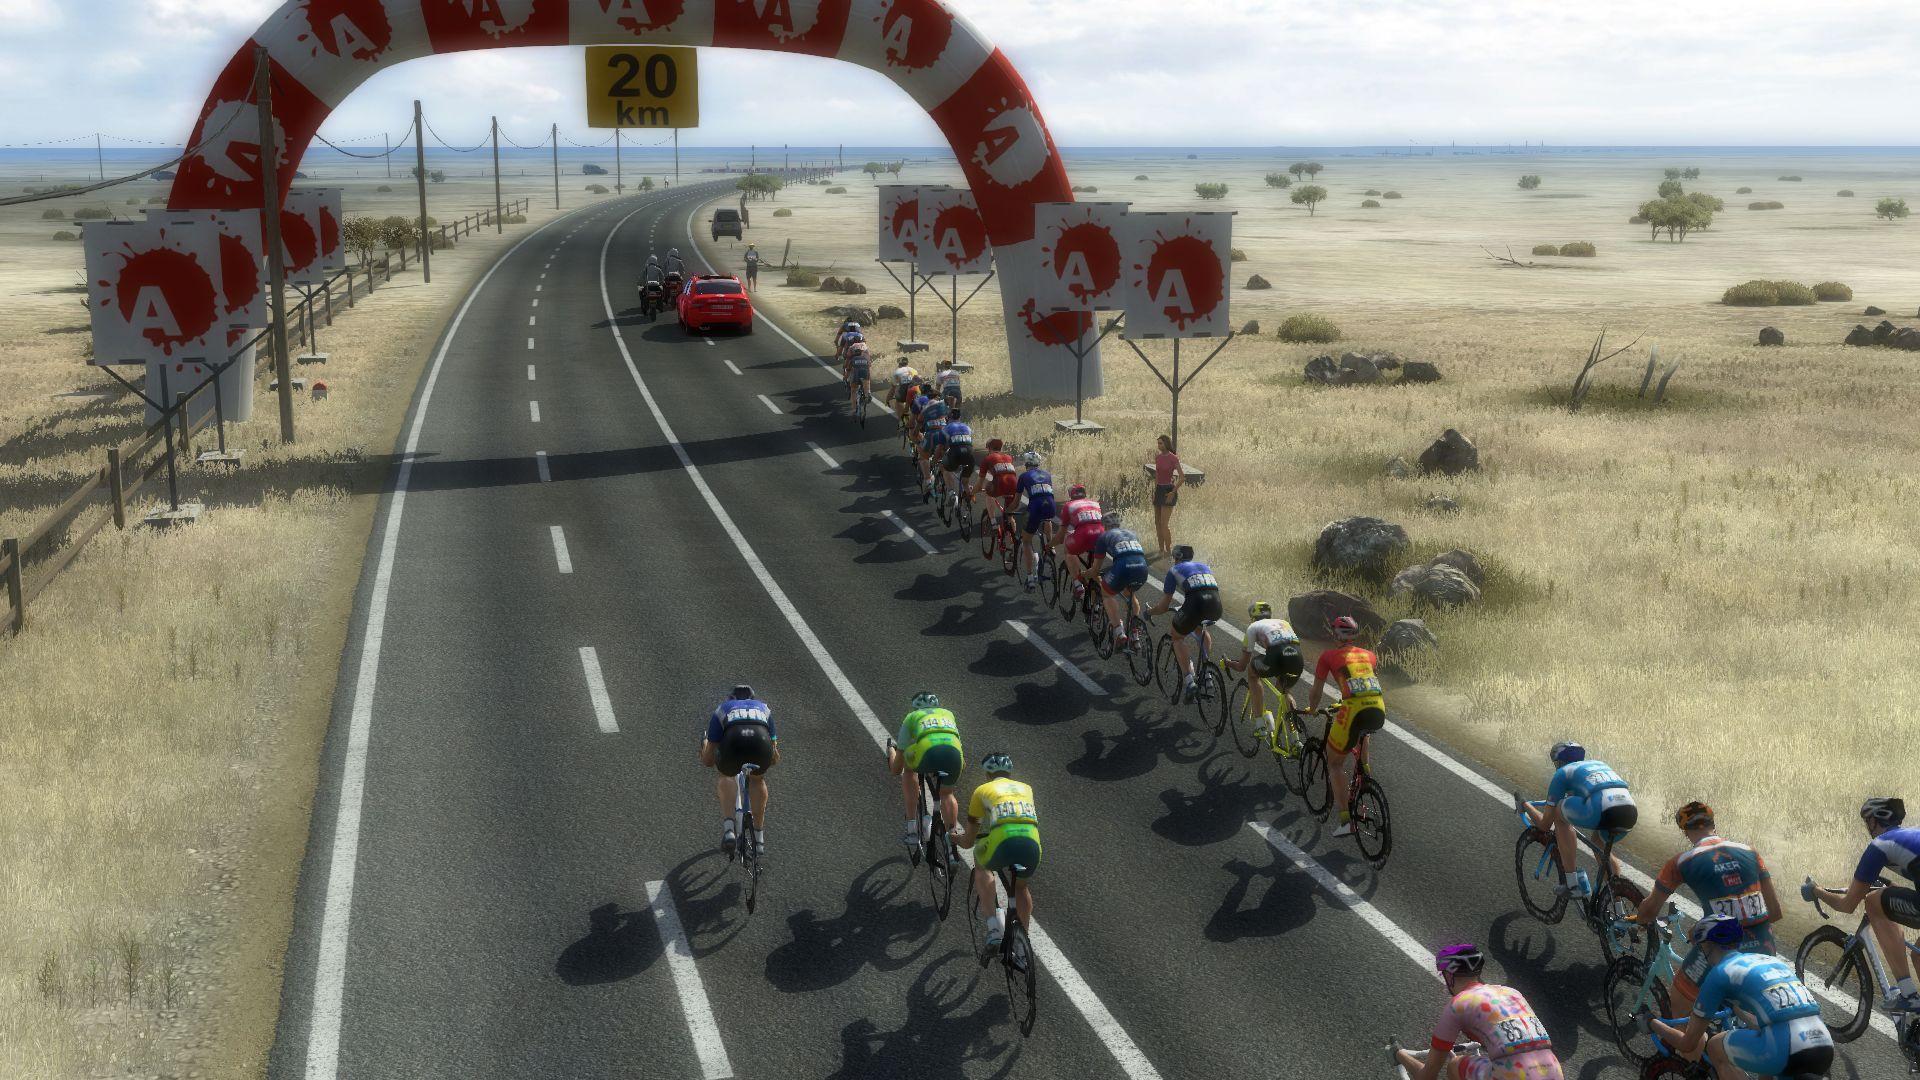 pcmdaily.com/images/mg/2019/Races/PT/Qatar/mg19_qat_s03_09.jpg